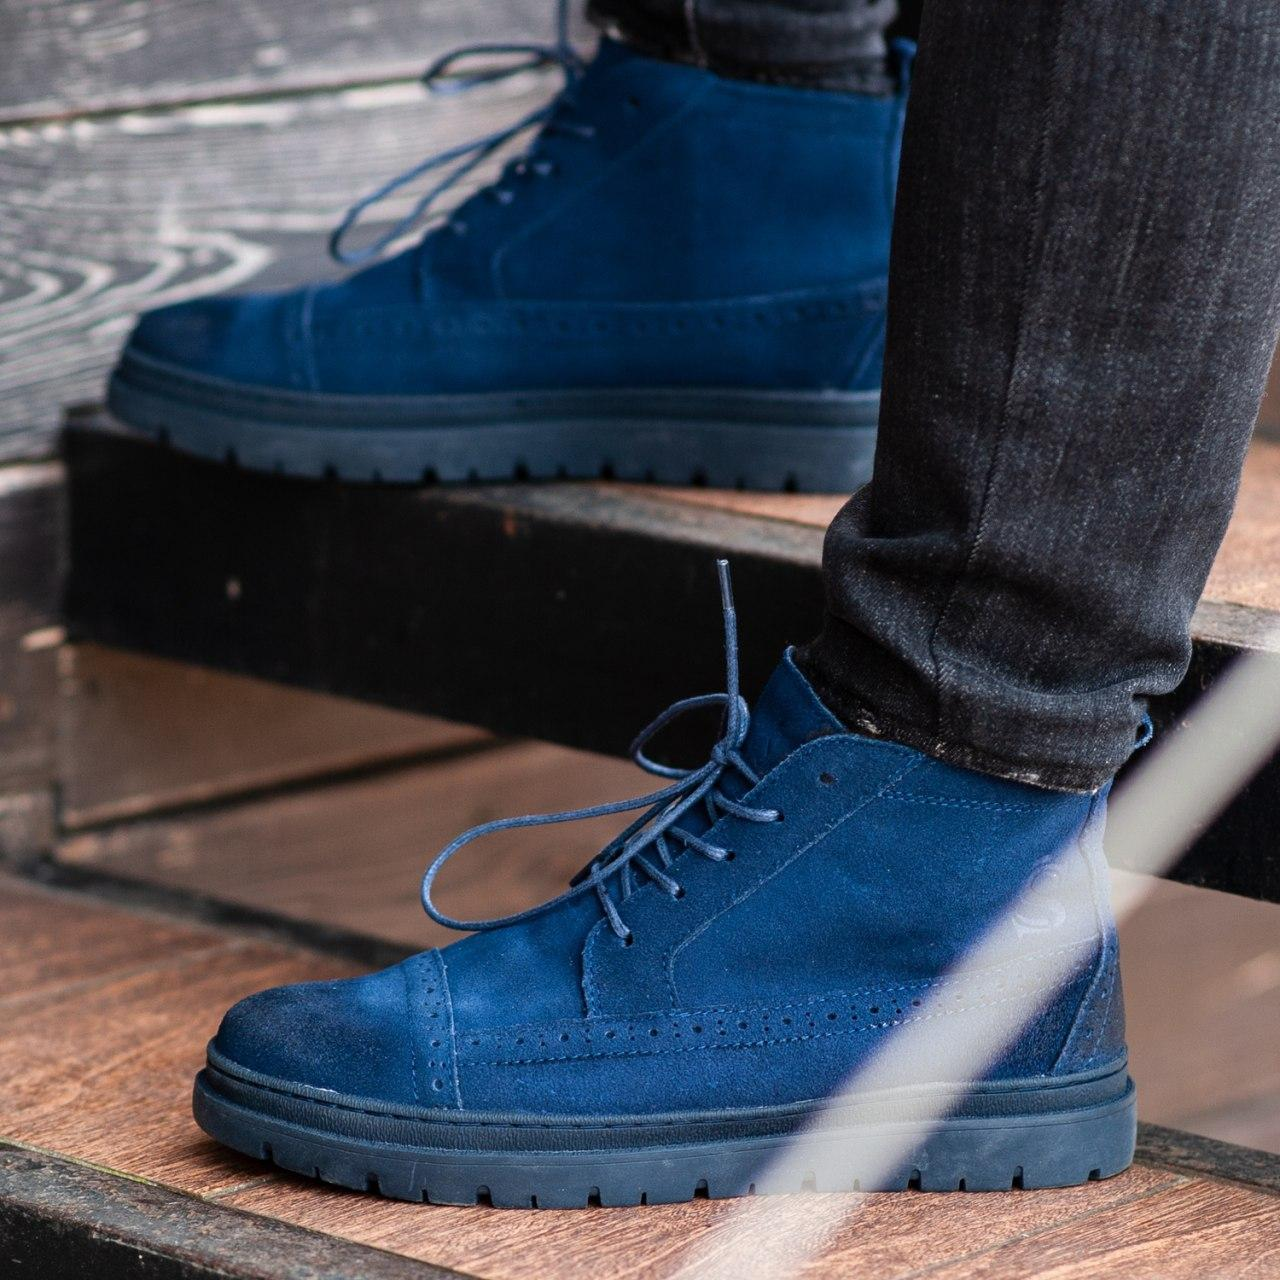 Ботинки South mist blue - фото 1